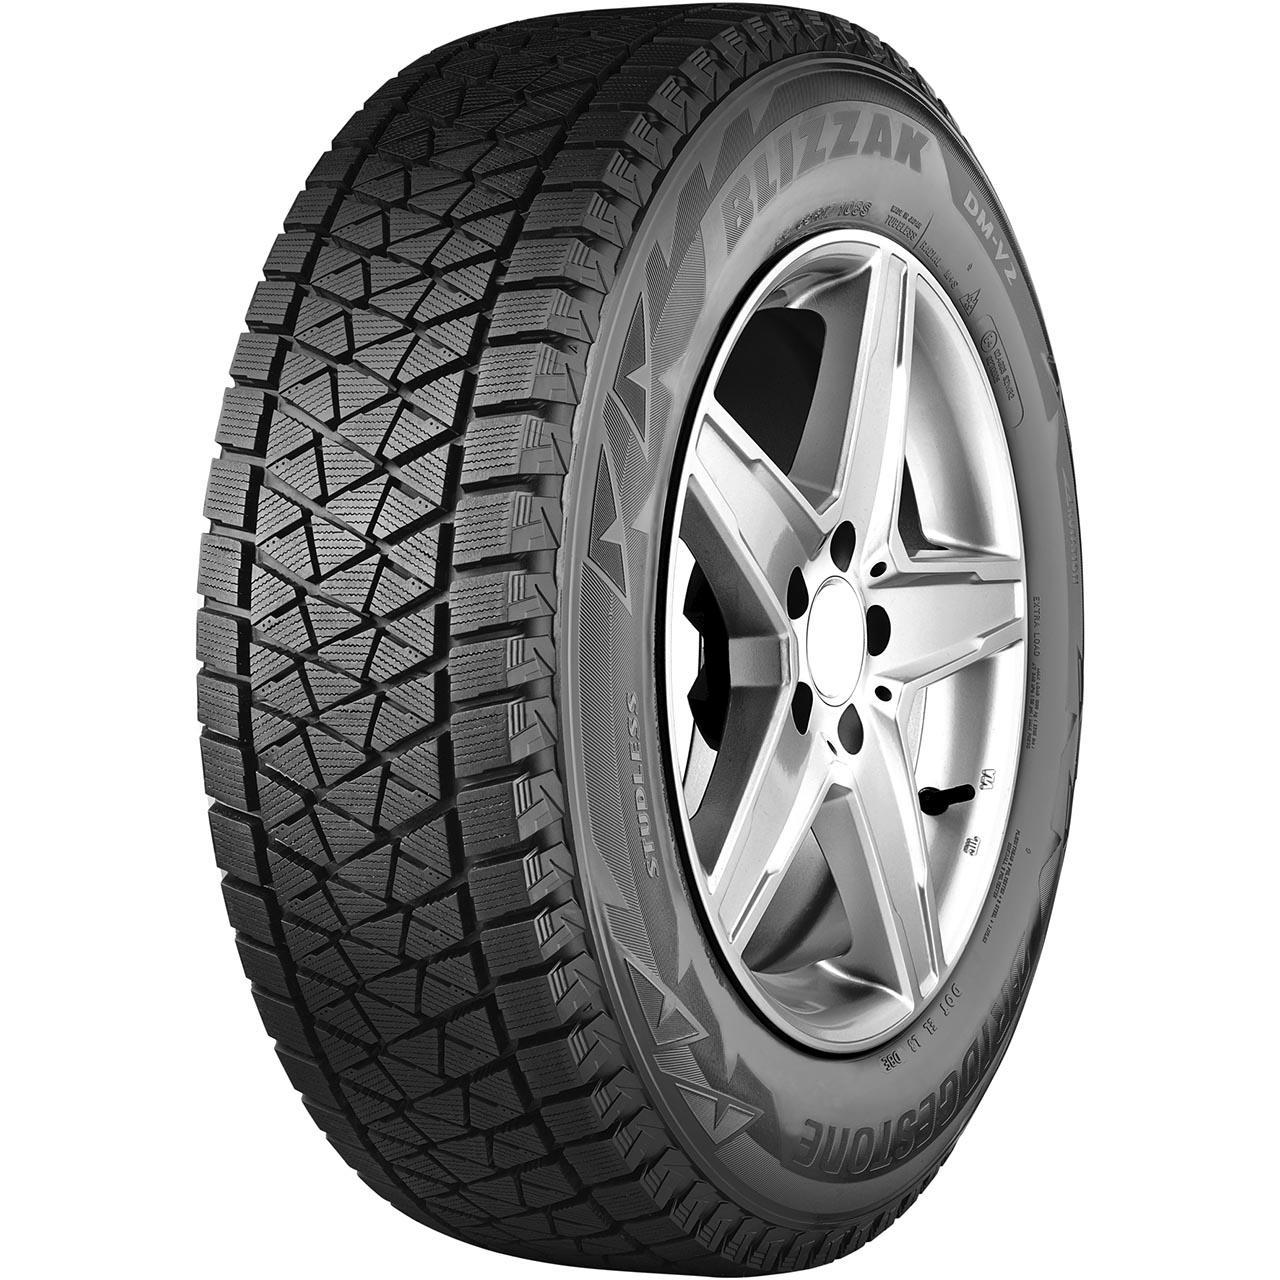 Bridgestone Blizzak DM V2 235/60R18 107S XL MFS M+S